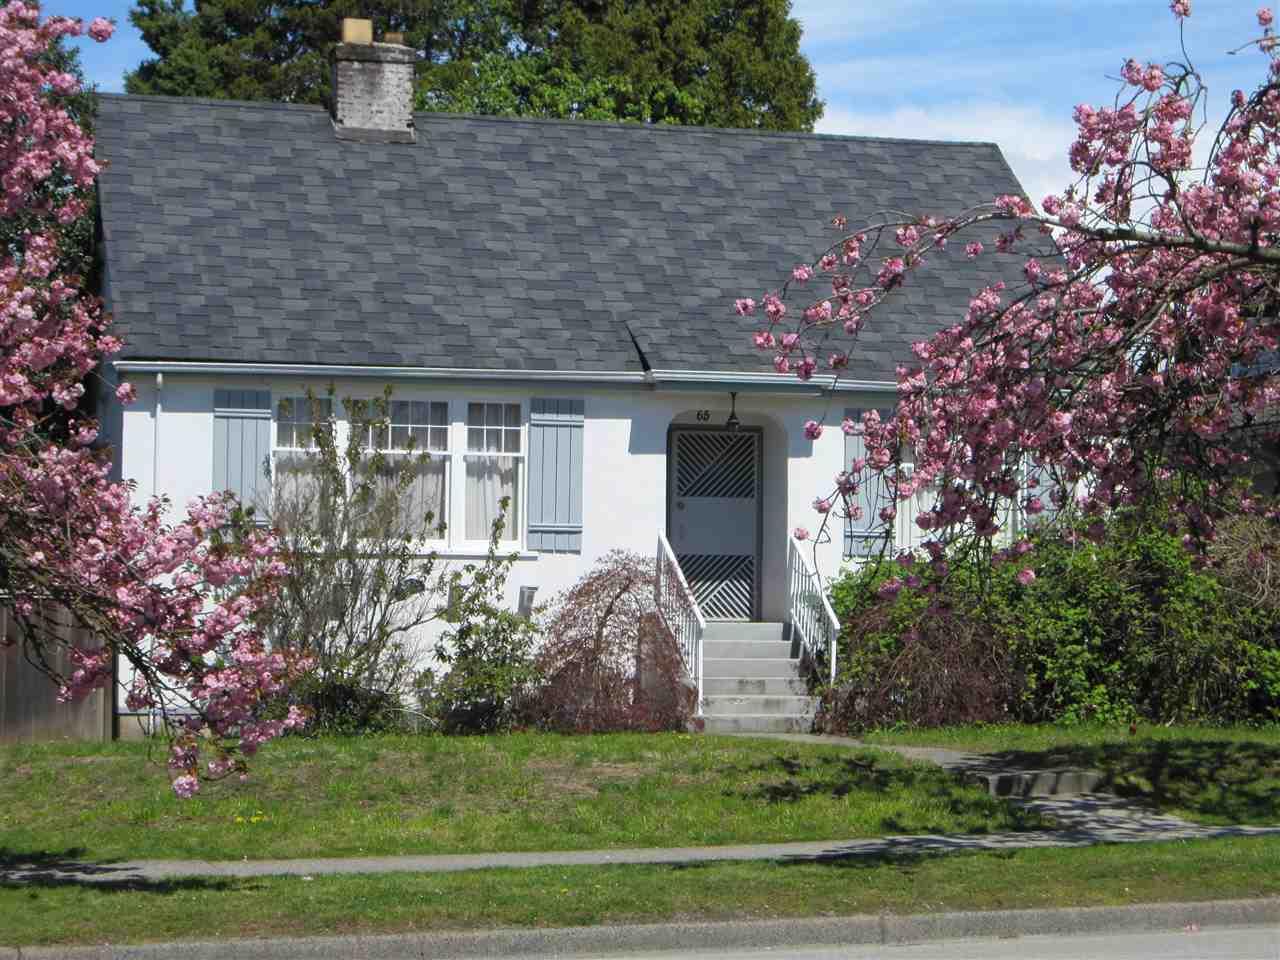 65 W KING EDWARD AVENUE, Vancouver, BC V5Y 2H6